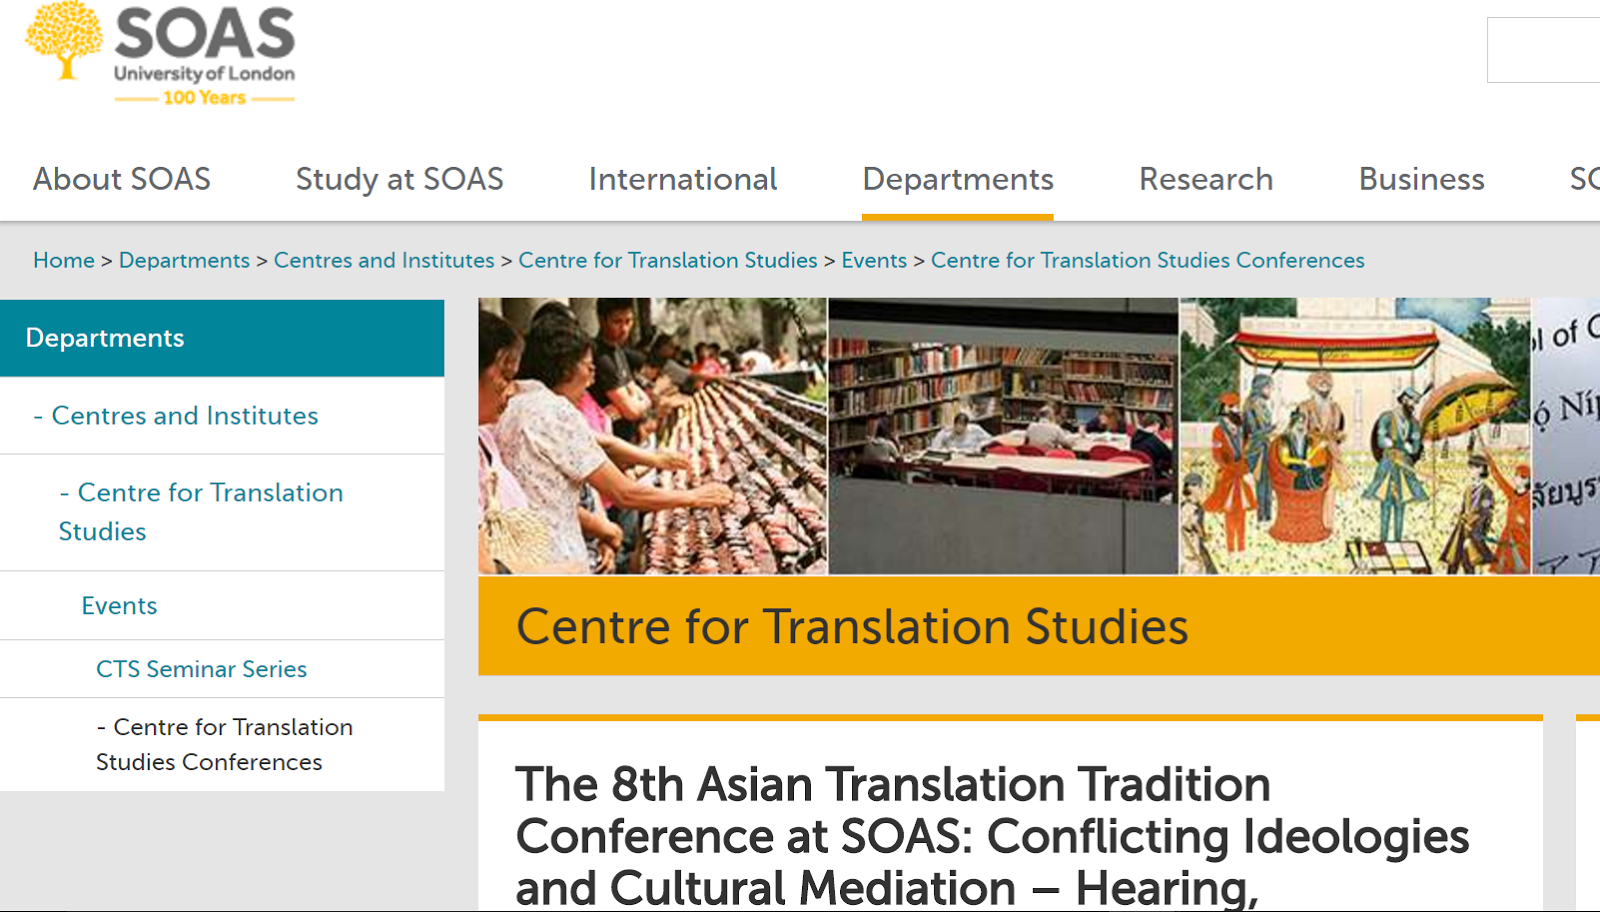 Freak! Asian mediation association conference it